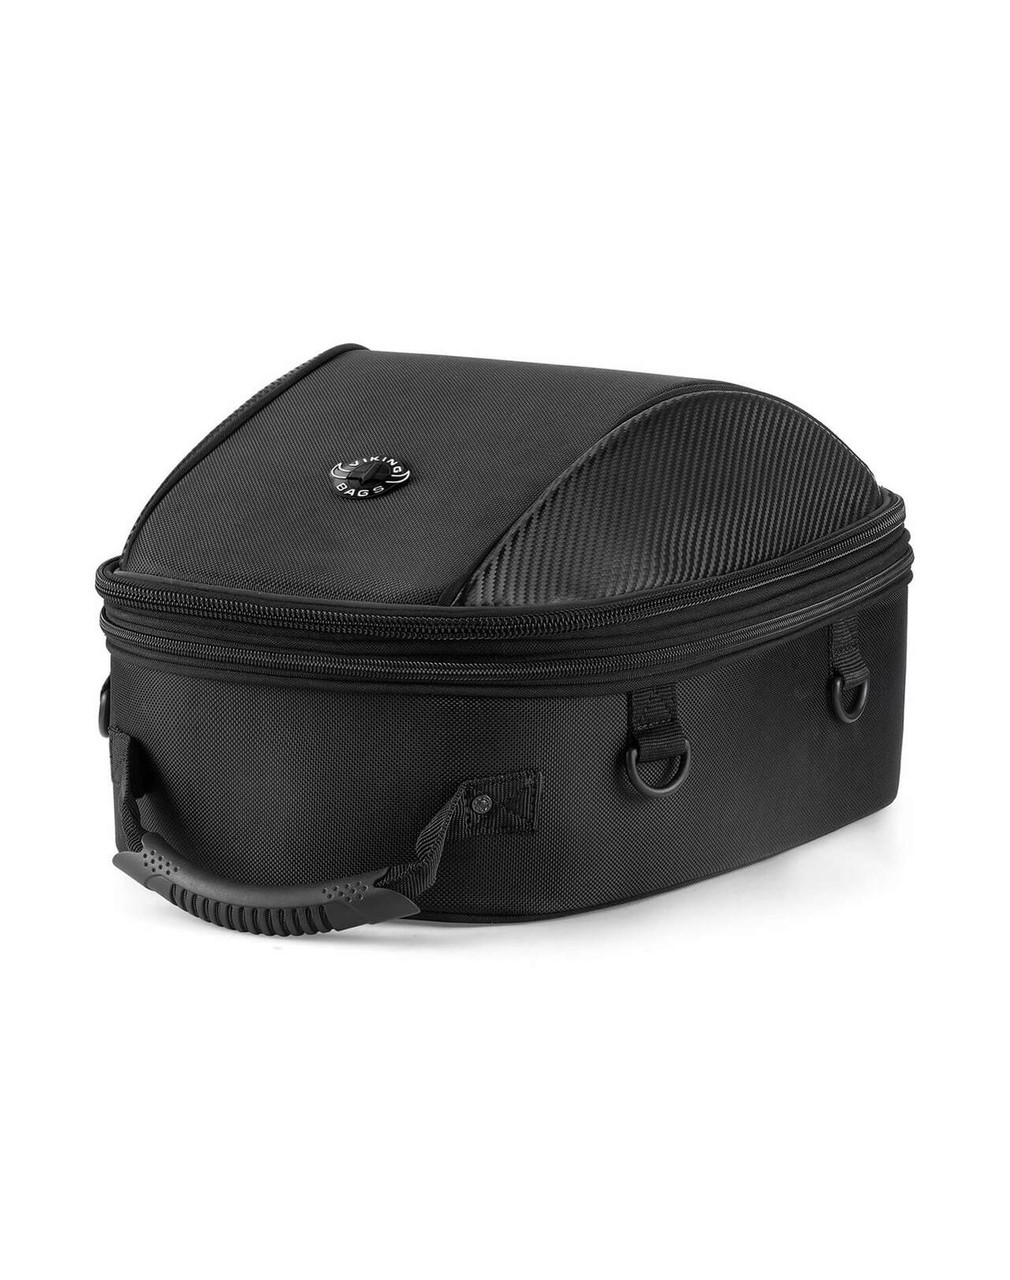 Viking Large Black Tail Bag For Harley Davidson Main View